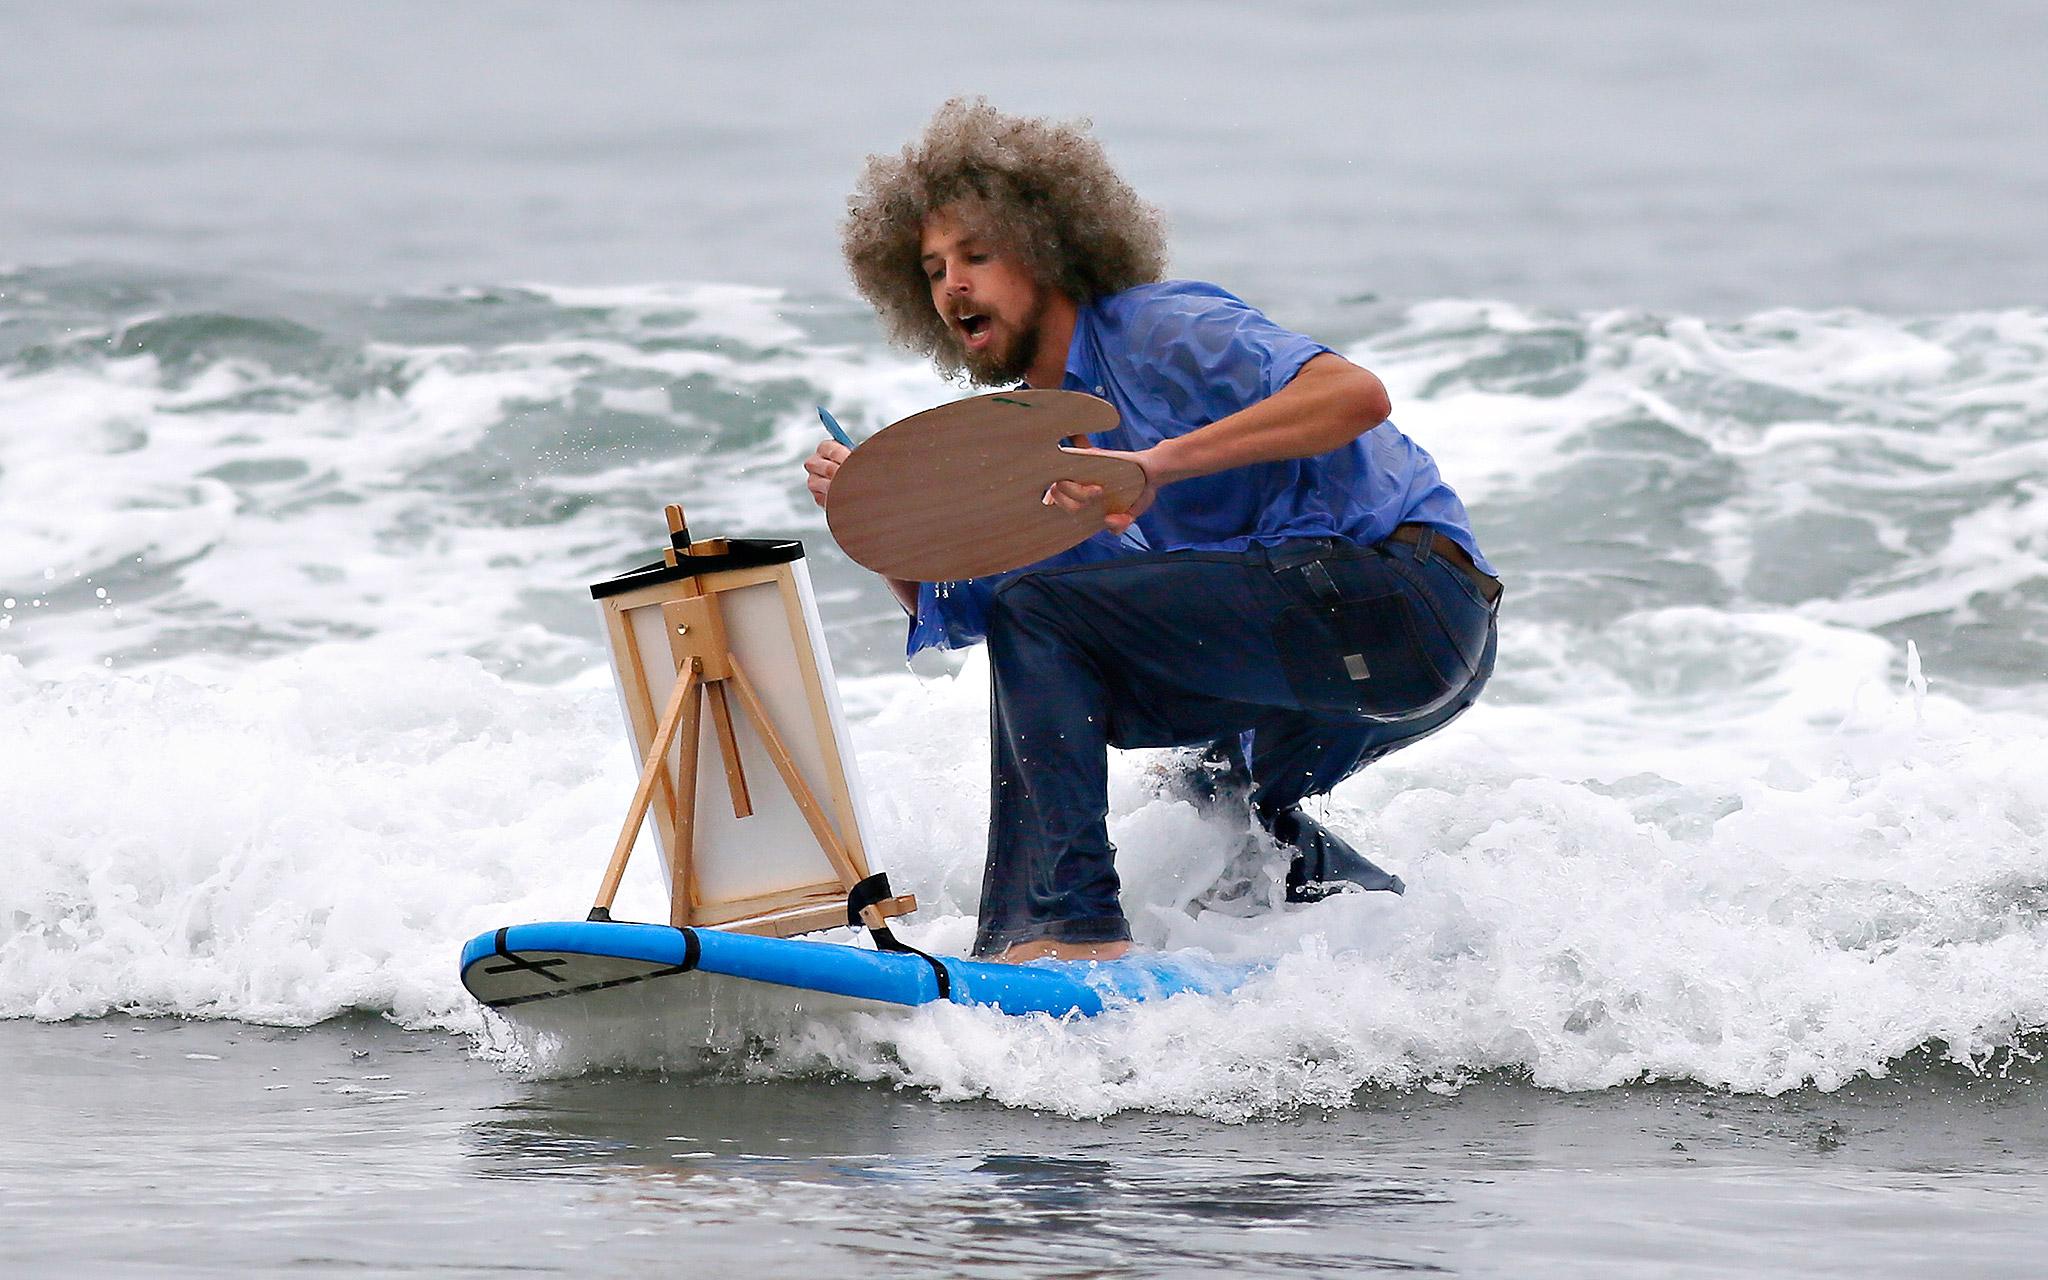 surfing in costume - Szukaj w Google